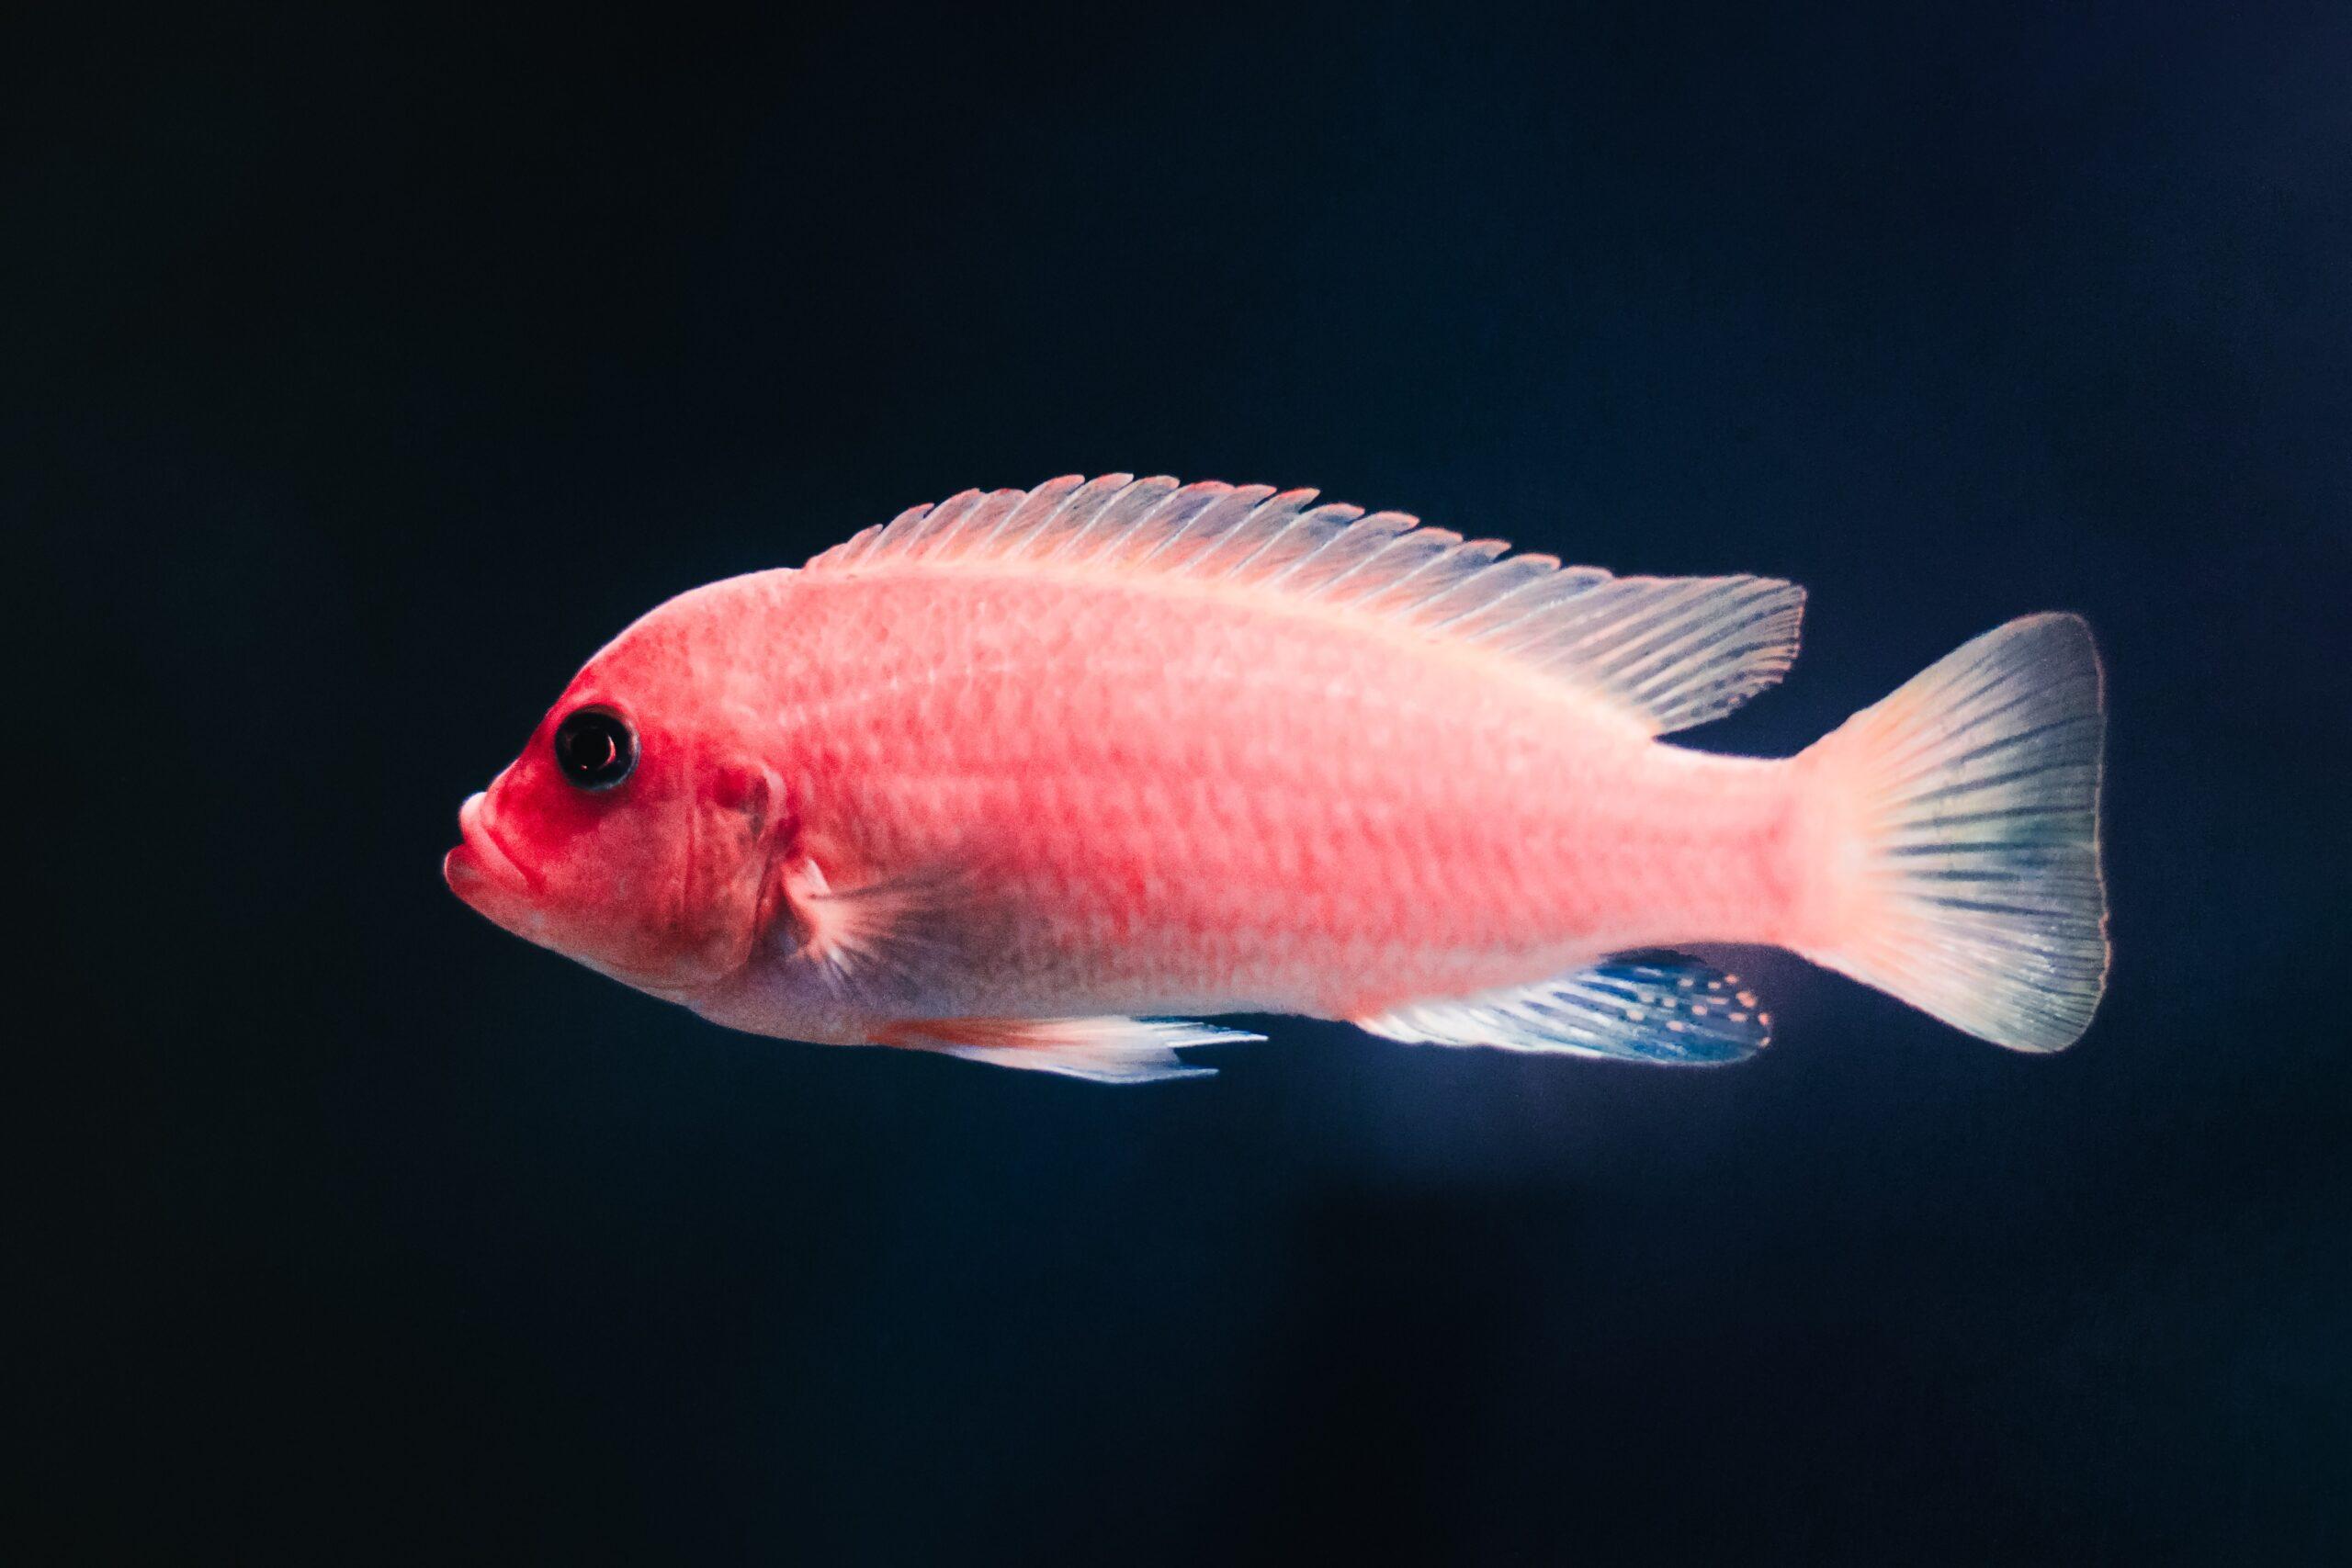 Is Katie Ledecky a fish?